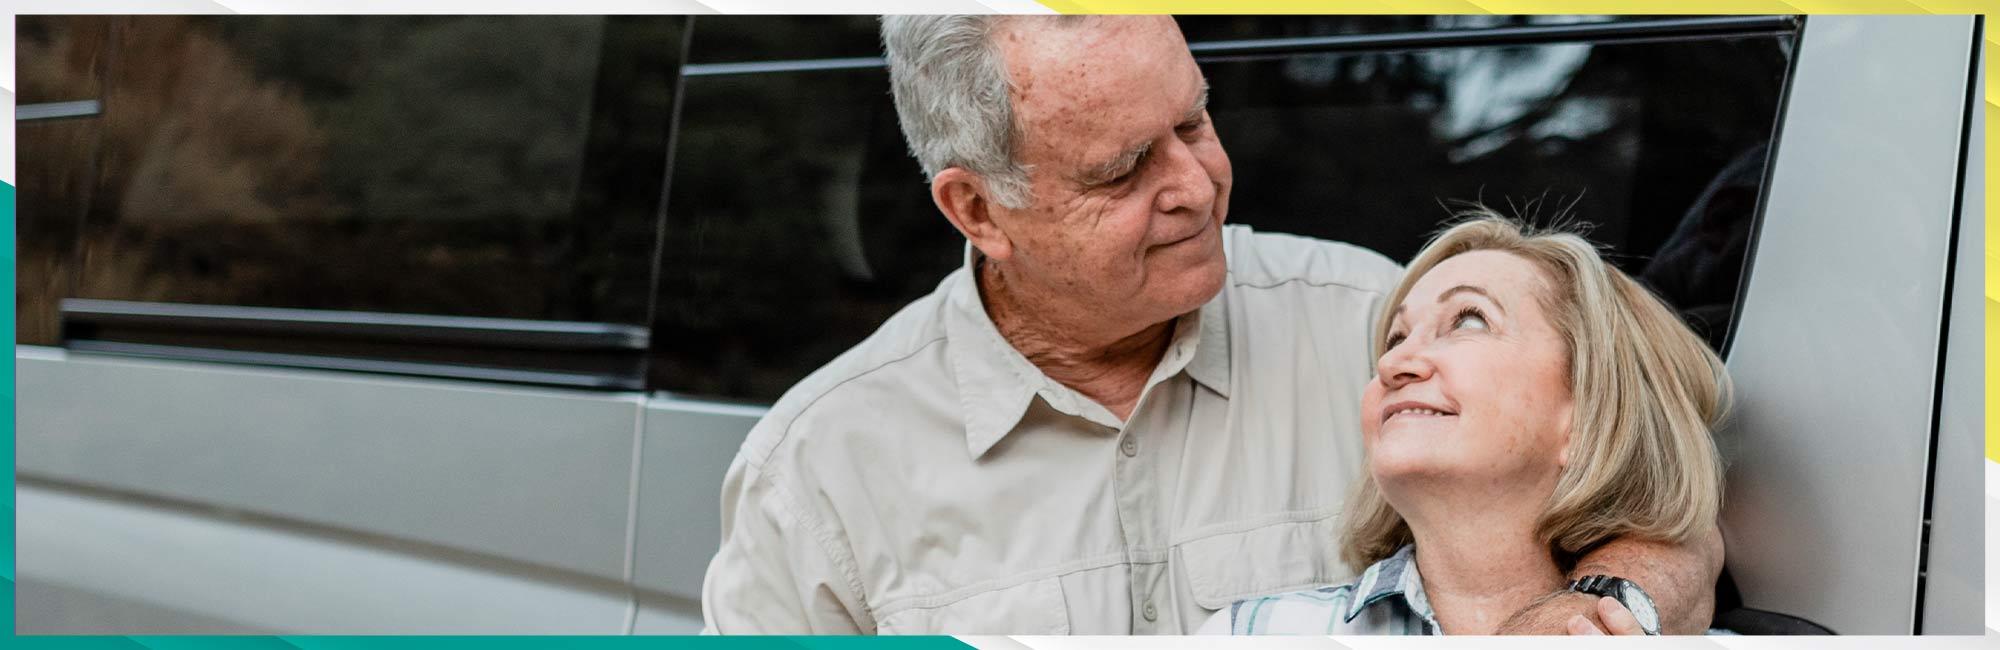 RV retirement living